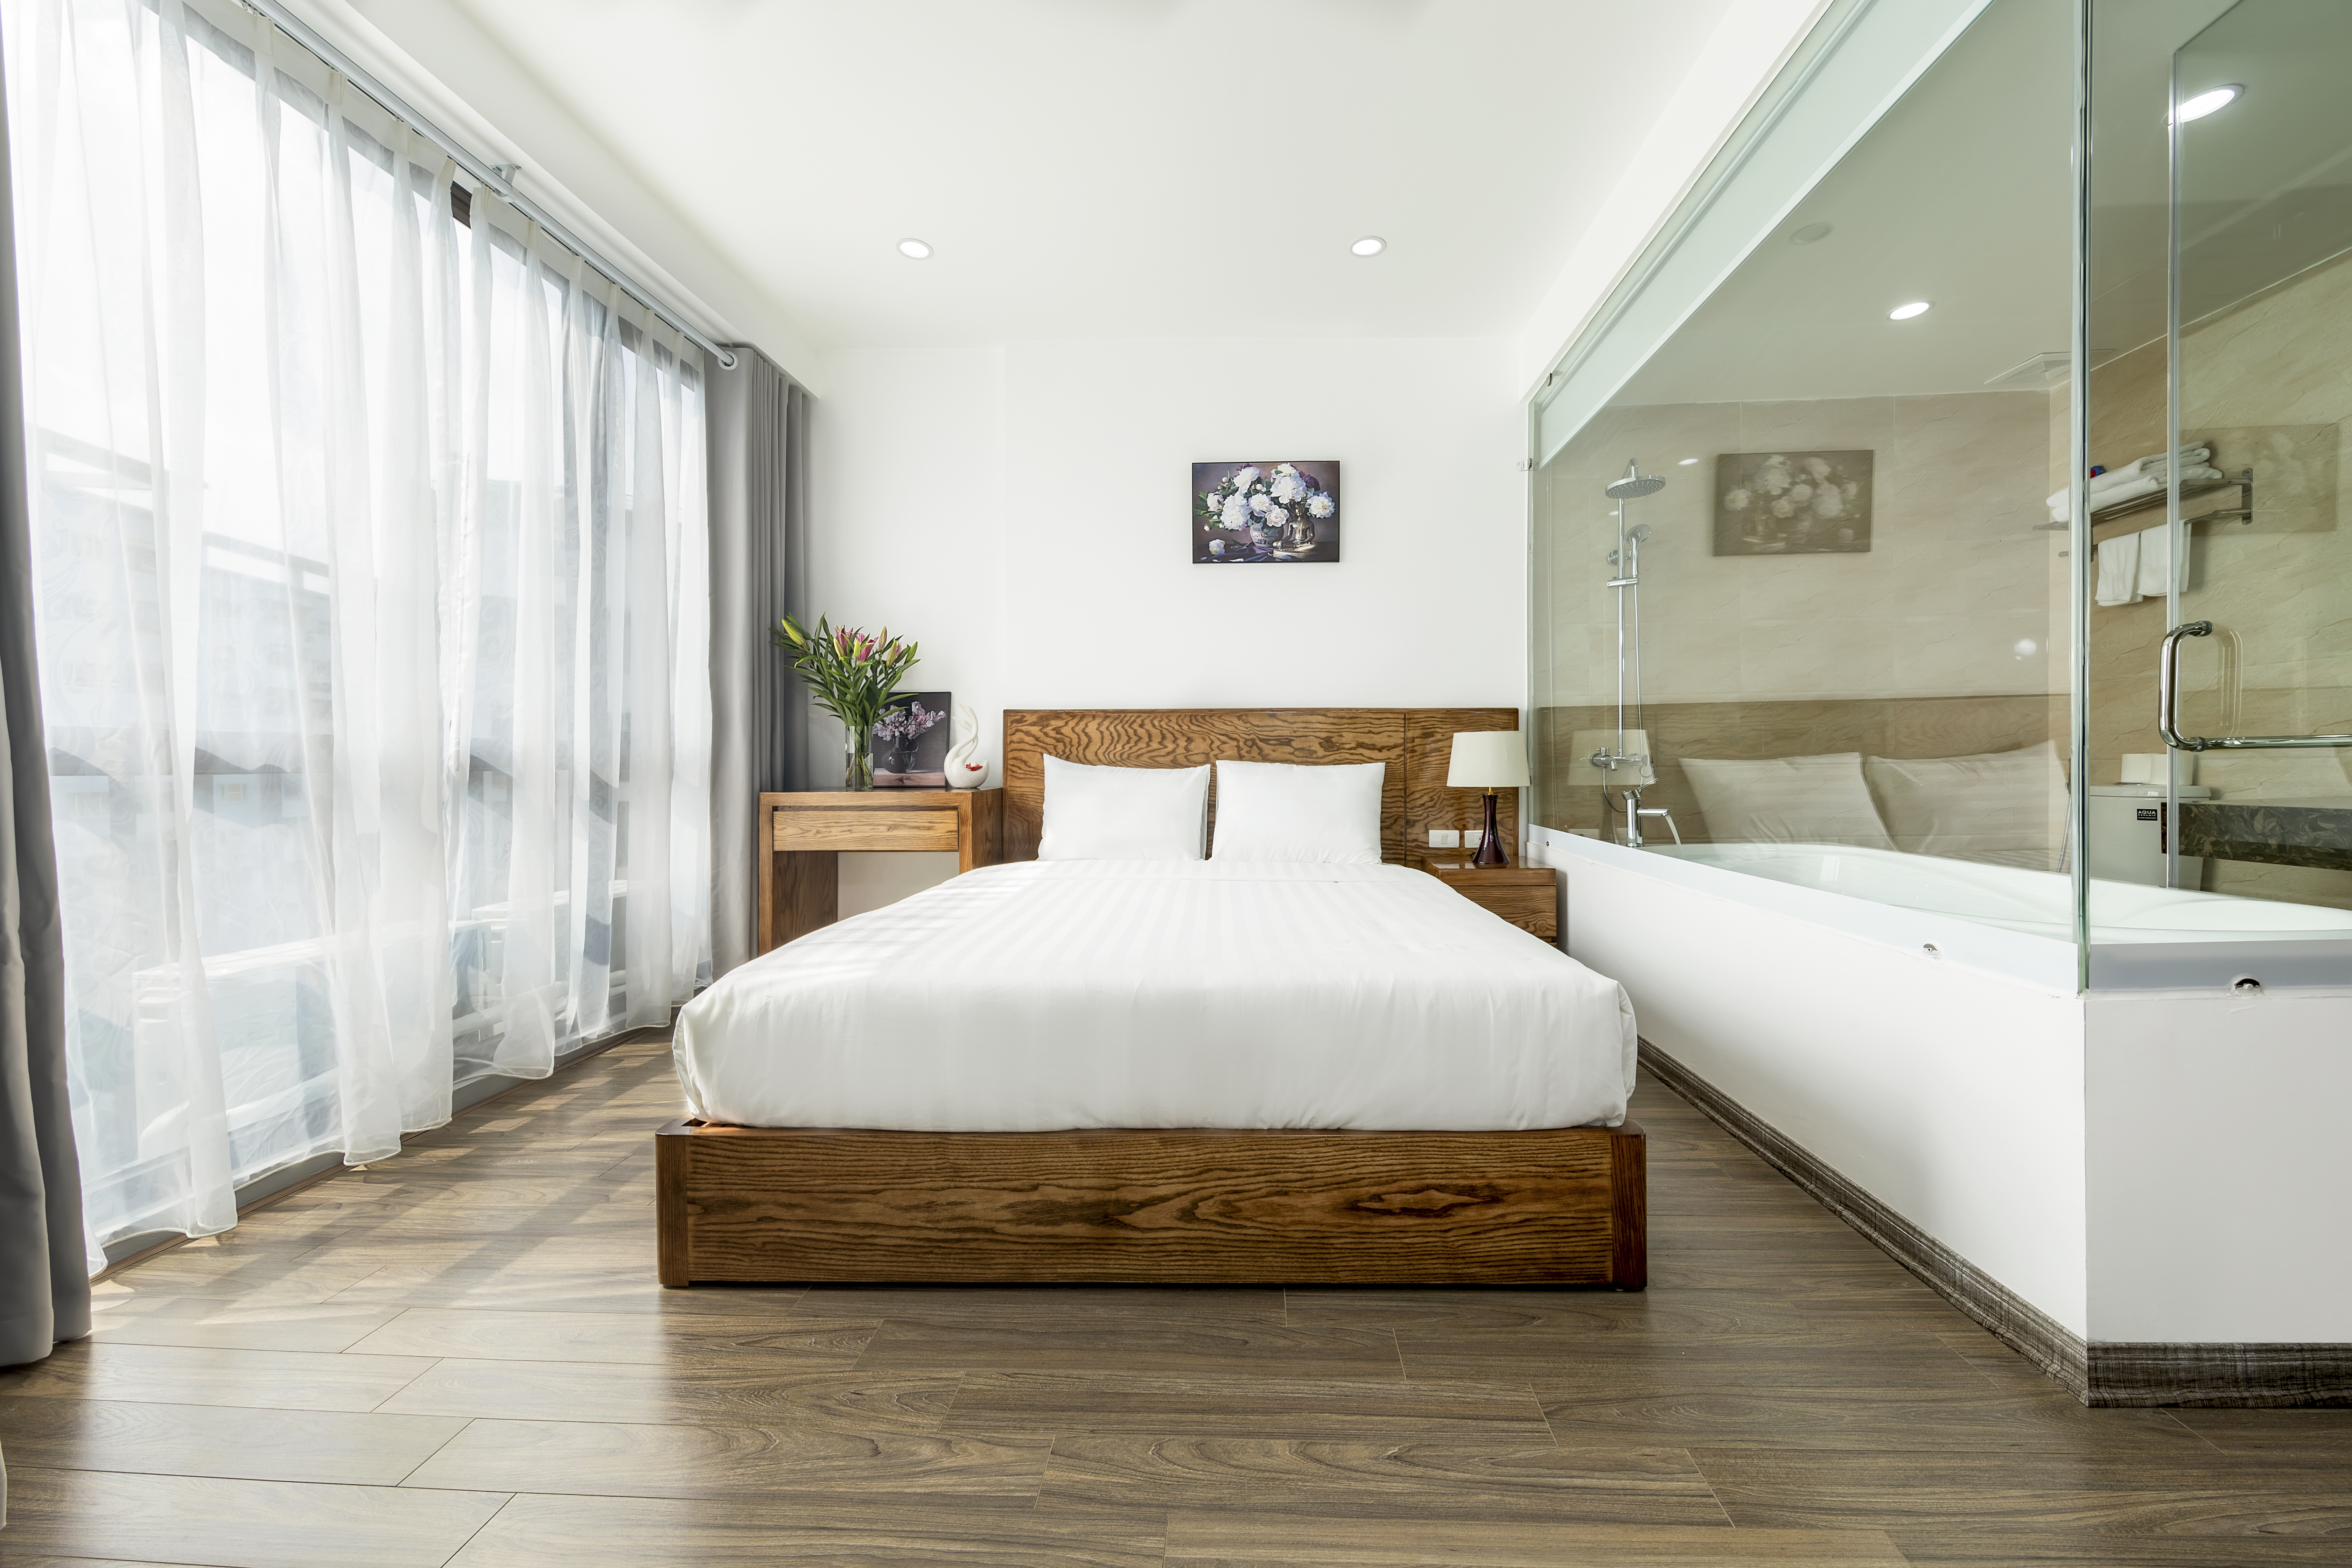 Cau Giay地区のサービスアパート、Granda Suites Hanoiビル